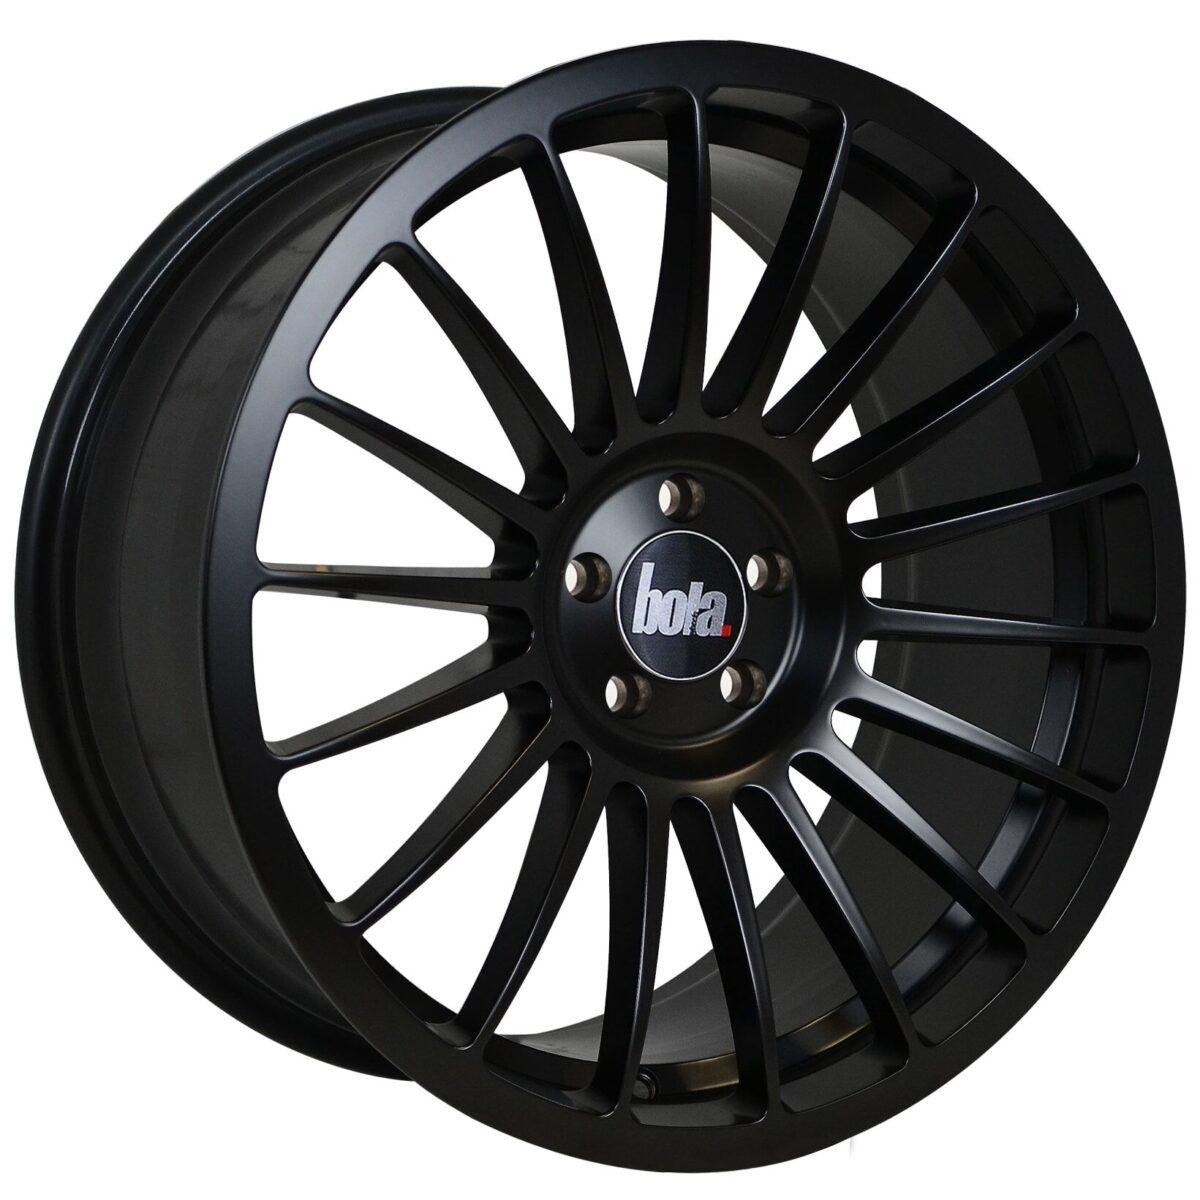 "18"" BOLA B14 Wheels - Matt Black - All BMW Models"